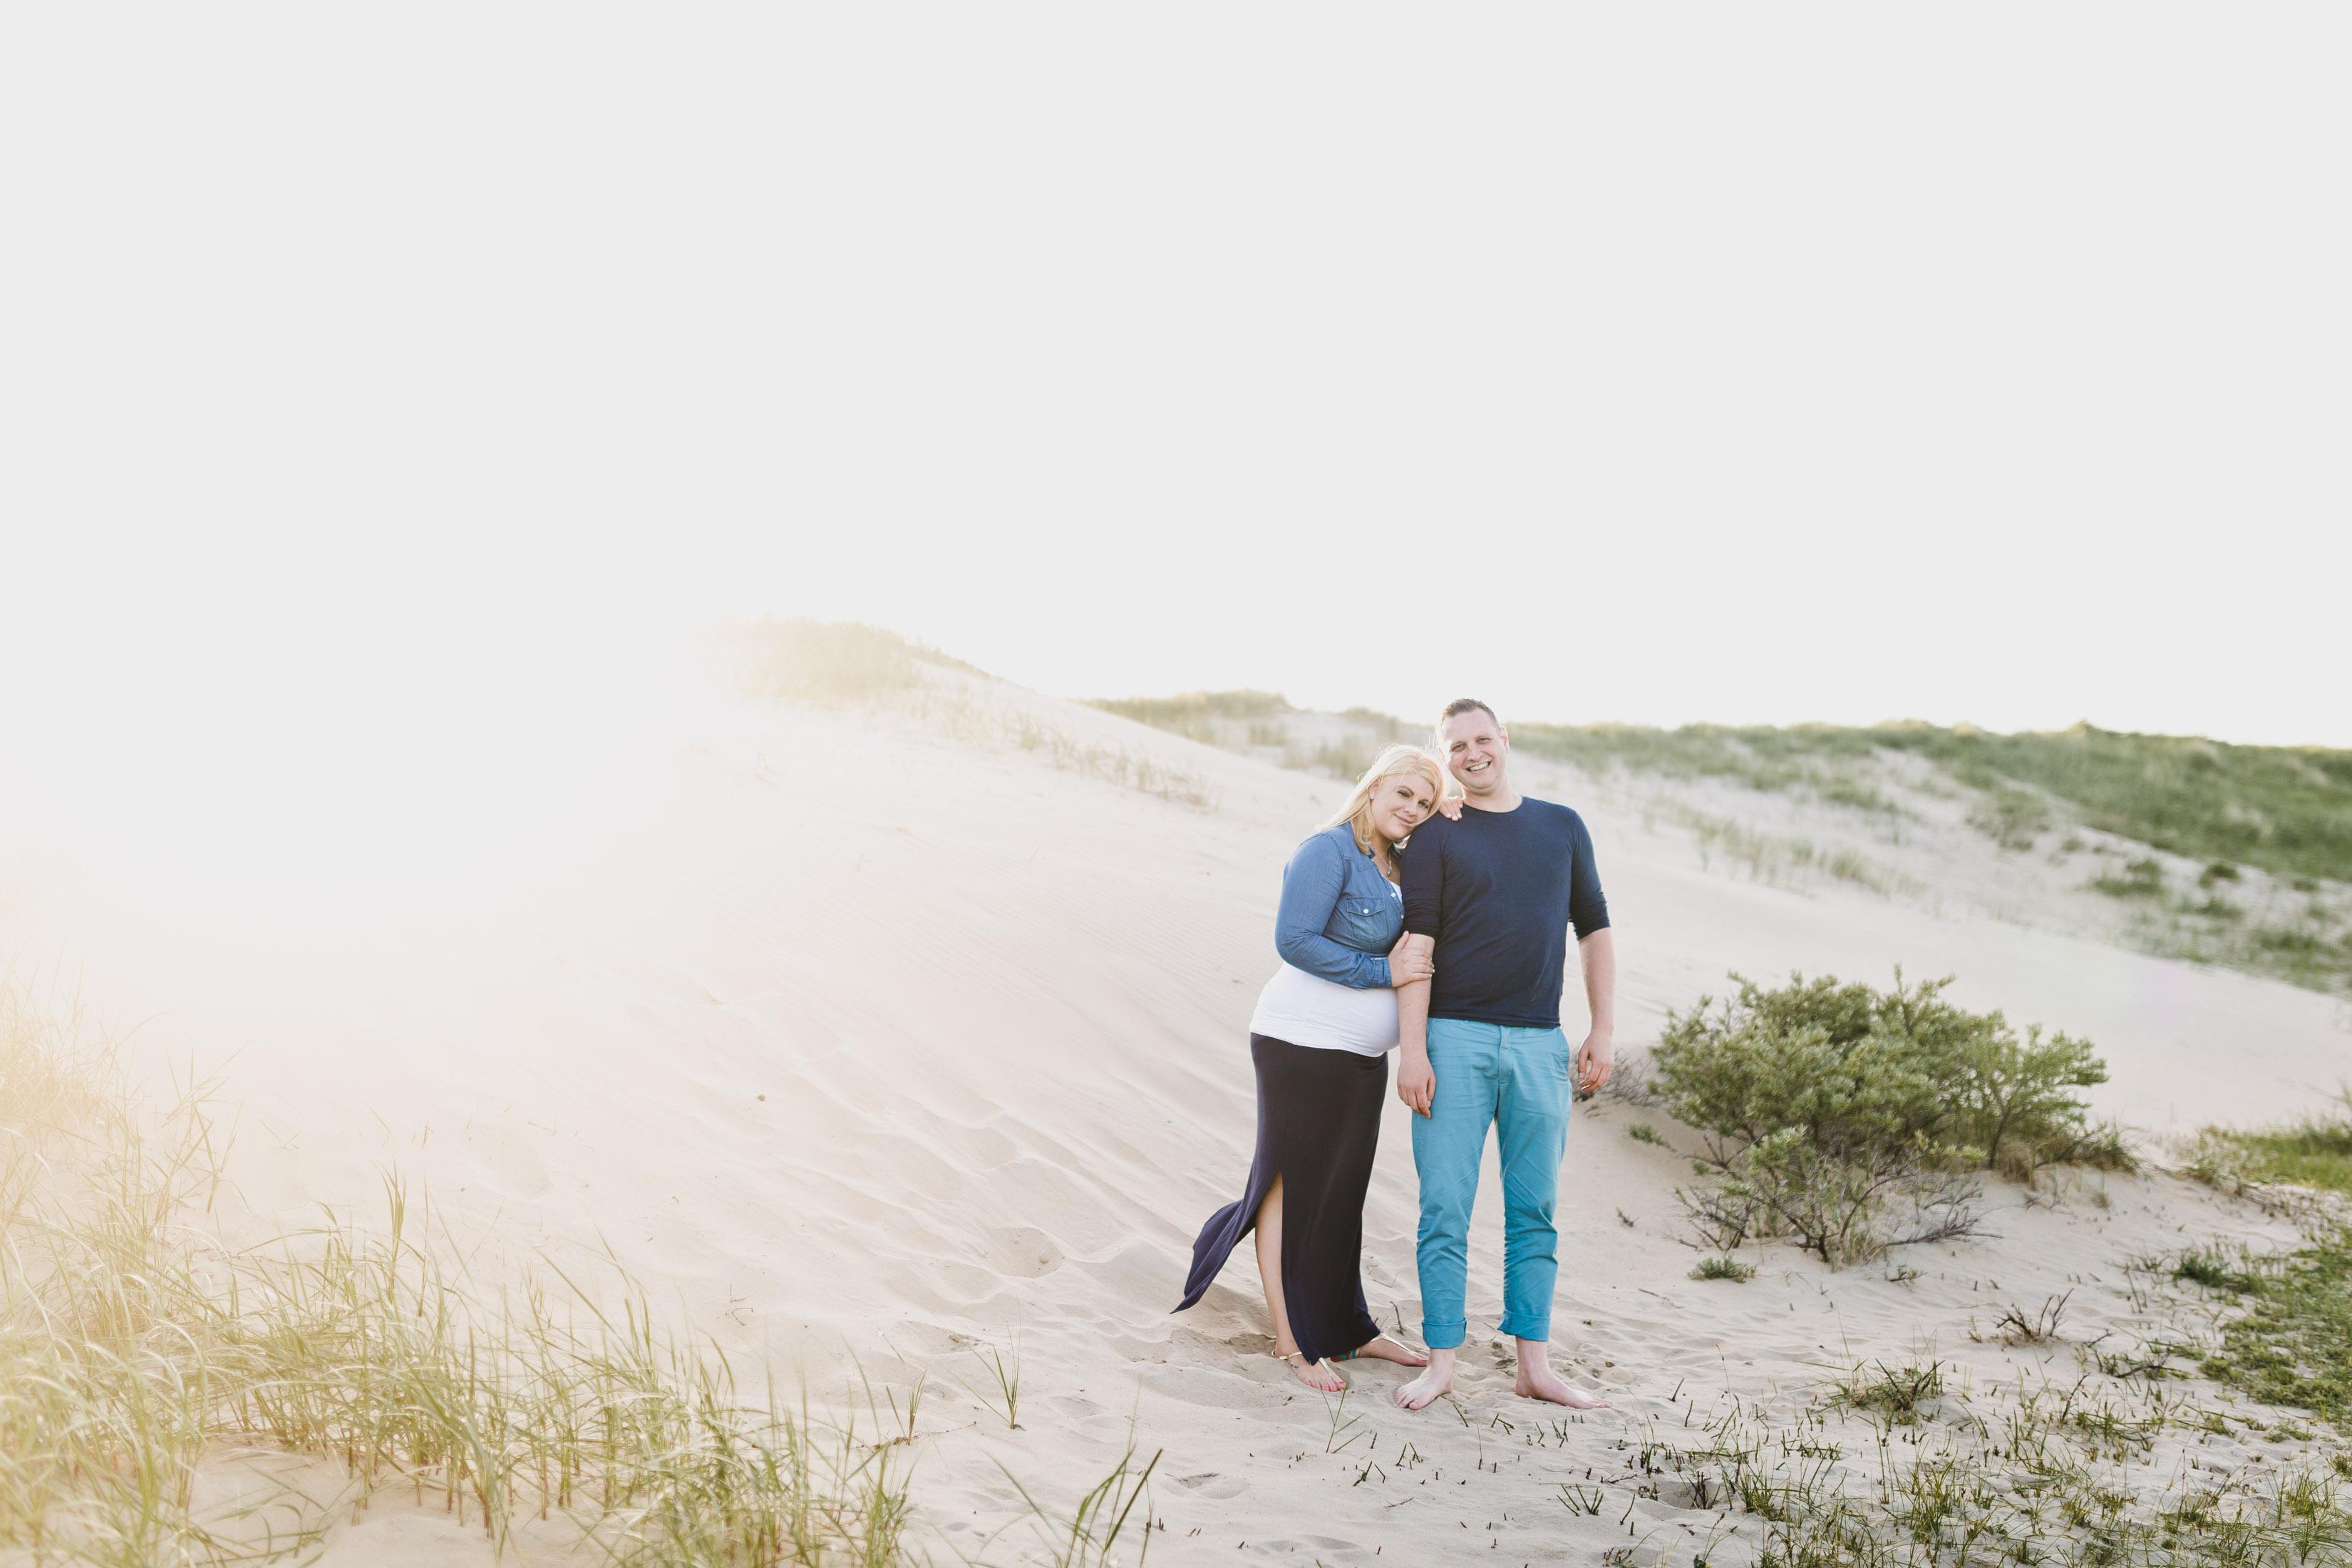 Engagement/love photographer